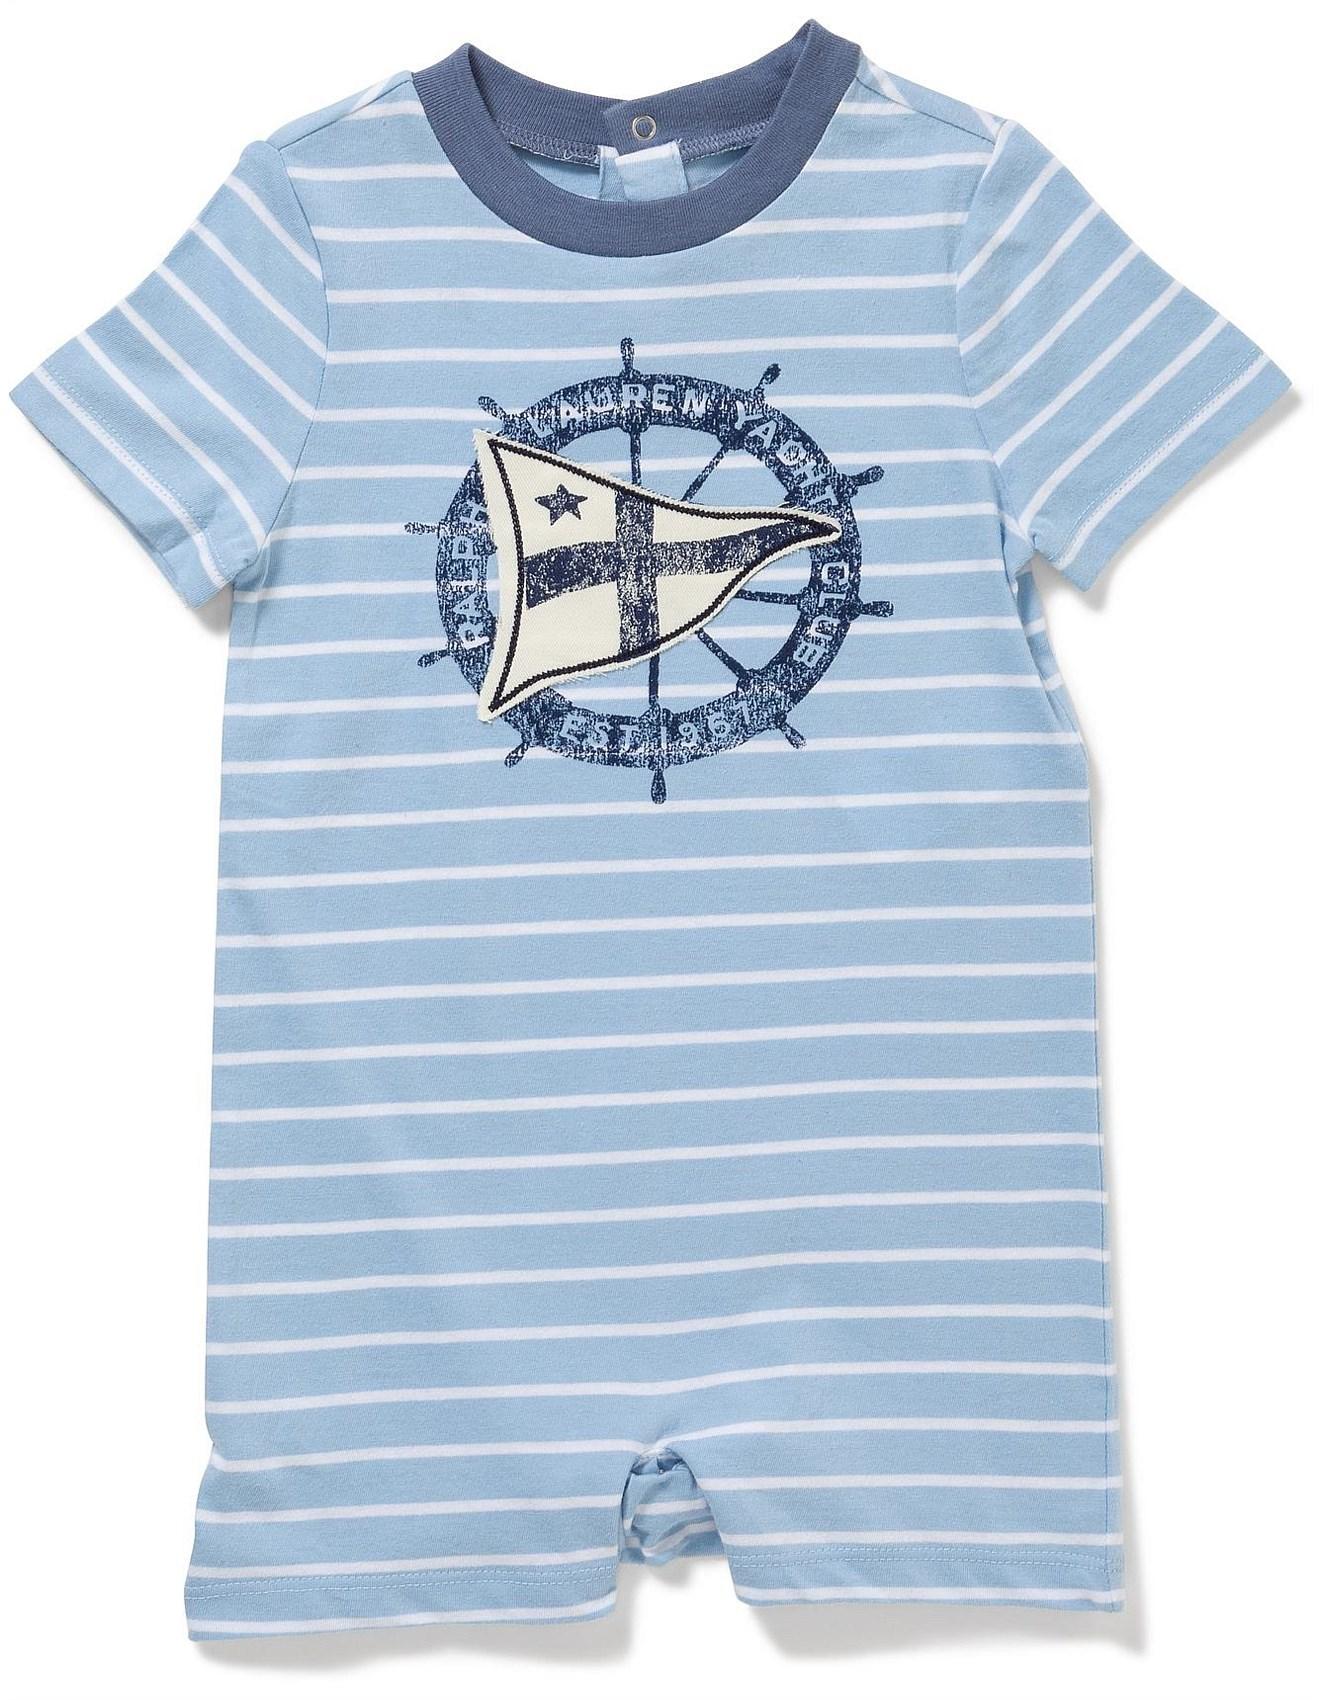 b711d93e9 Baby Boy Clothing Sale | Baby Boys Clothes Online | David Jones - Cotton  Jersey Graphic Shortall(6-24 Months)